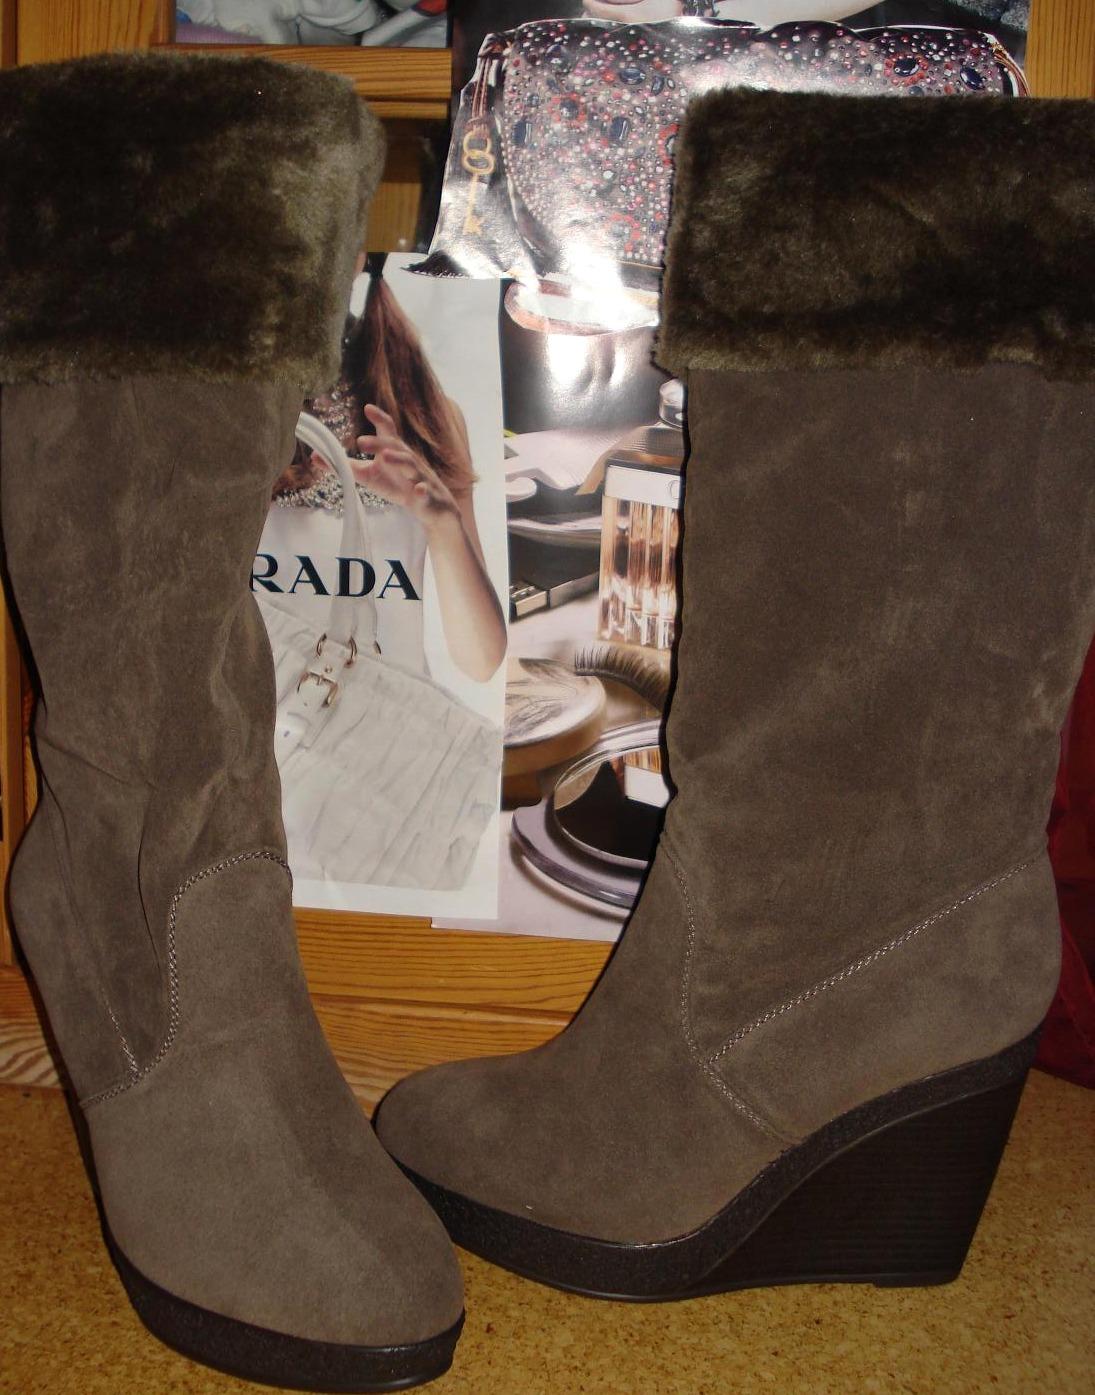 http://1.bp.blogspot.com/_gjR1KZVi5nE/TUhD6EtKRwI/AAAAAAAAAJc/kyjzZm0jI2g/s1600/boots.jpg